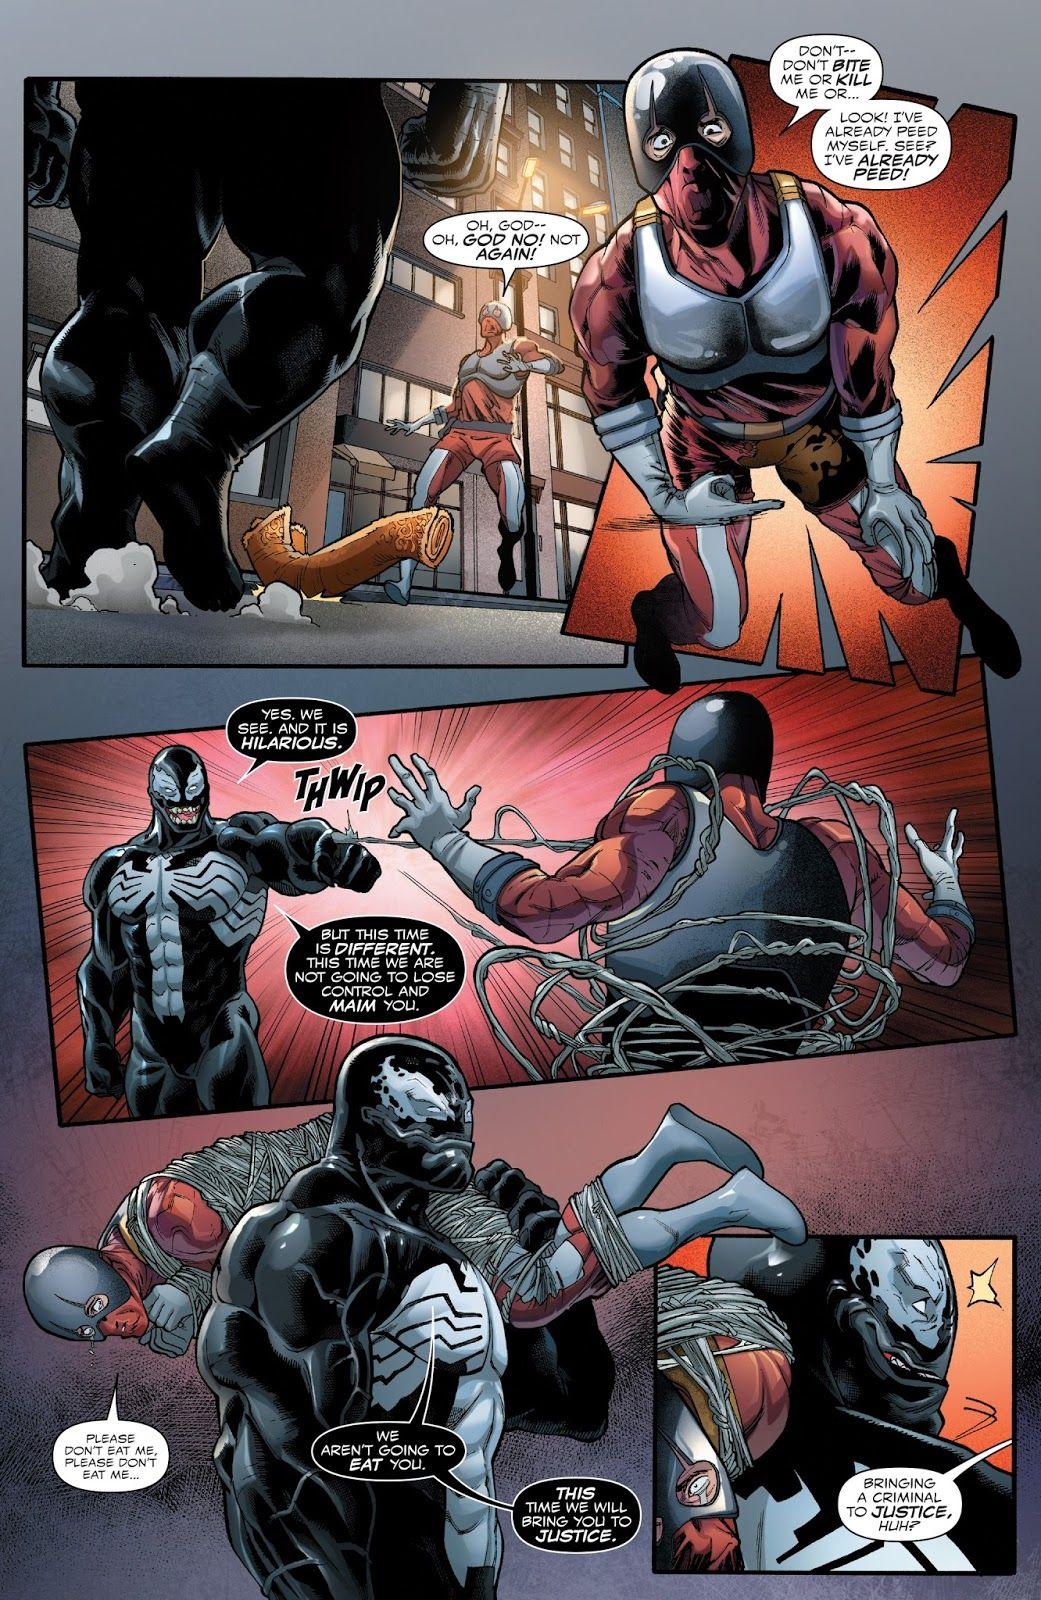 Venom 2016 Issue 161 Read Venom 2016 Issue 161 Comic Online In High Quality Spiderman Scary Superhero